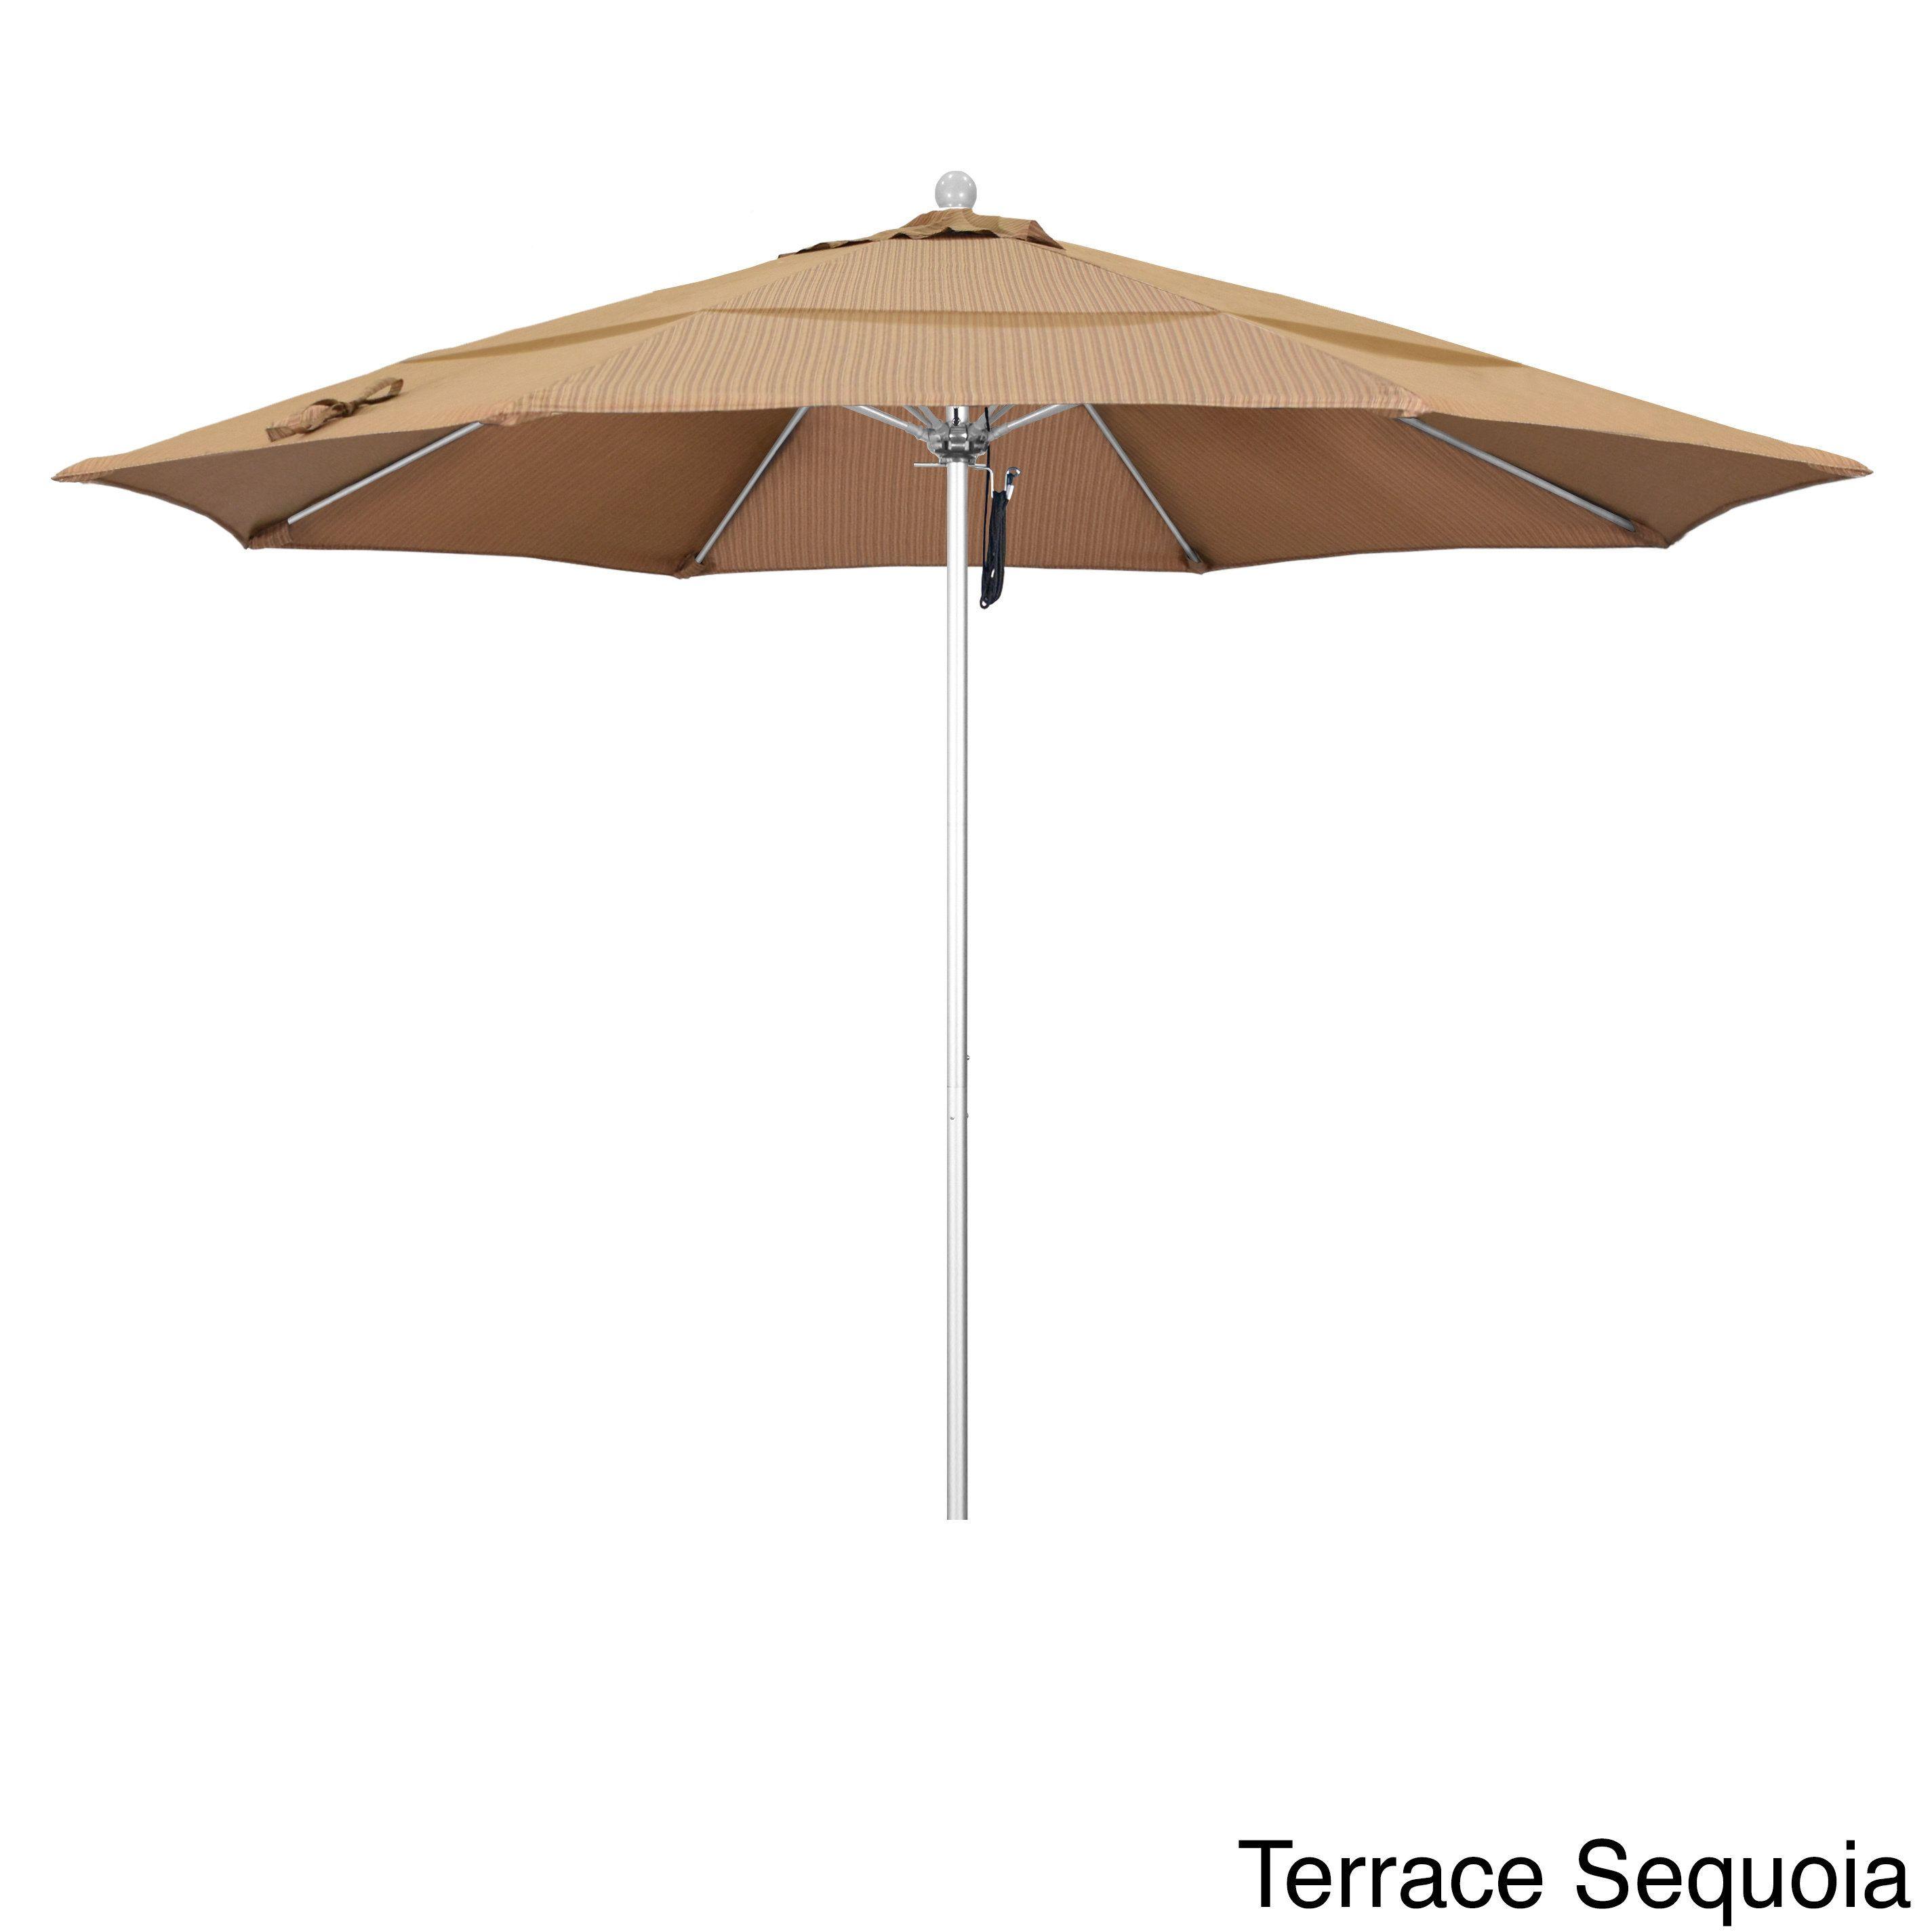 California Umbrella 11' Rd Frame, Fiberglass Rib Market Umbrella, Push Open, Anodized Silver Finish, Olefin Fabric